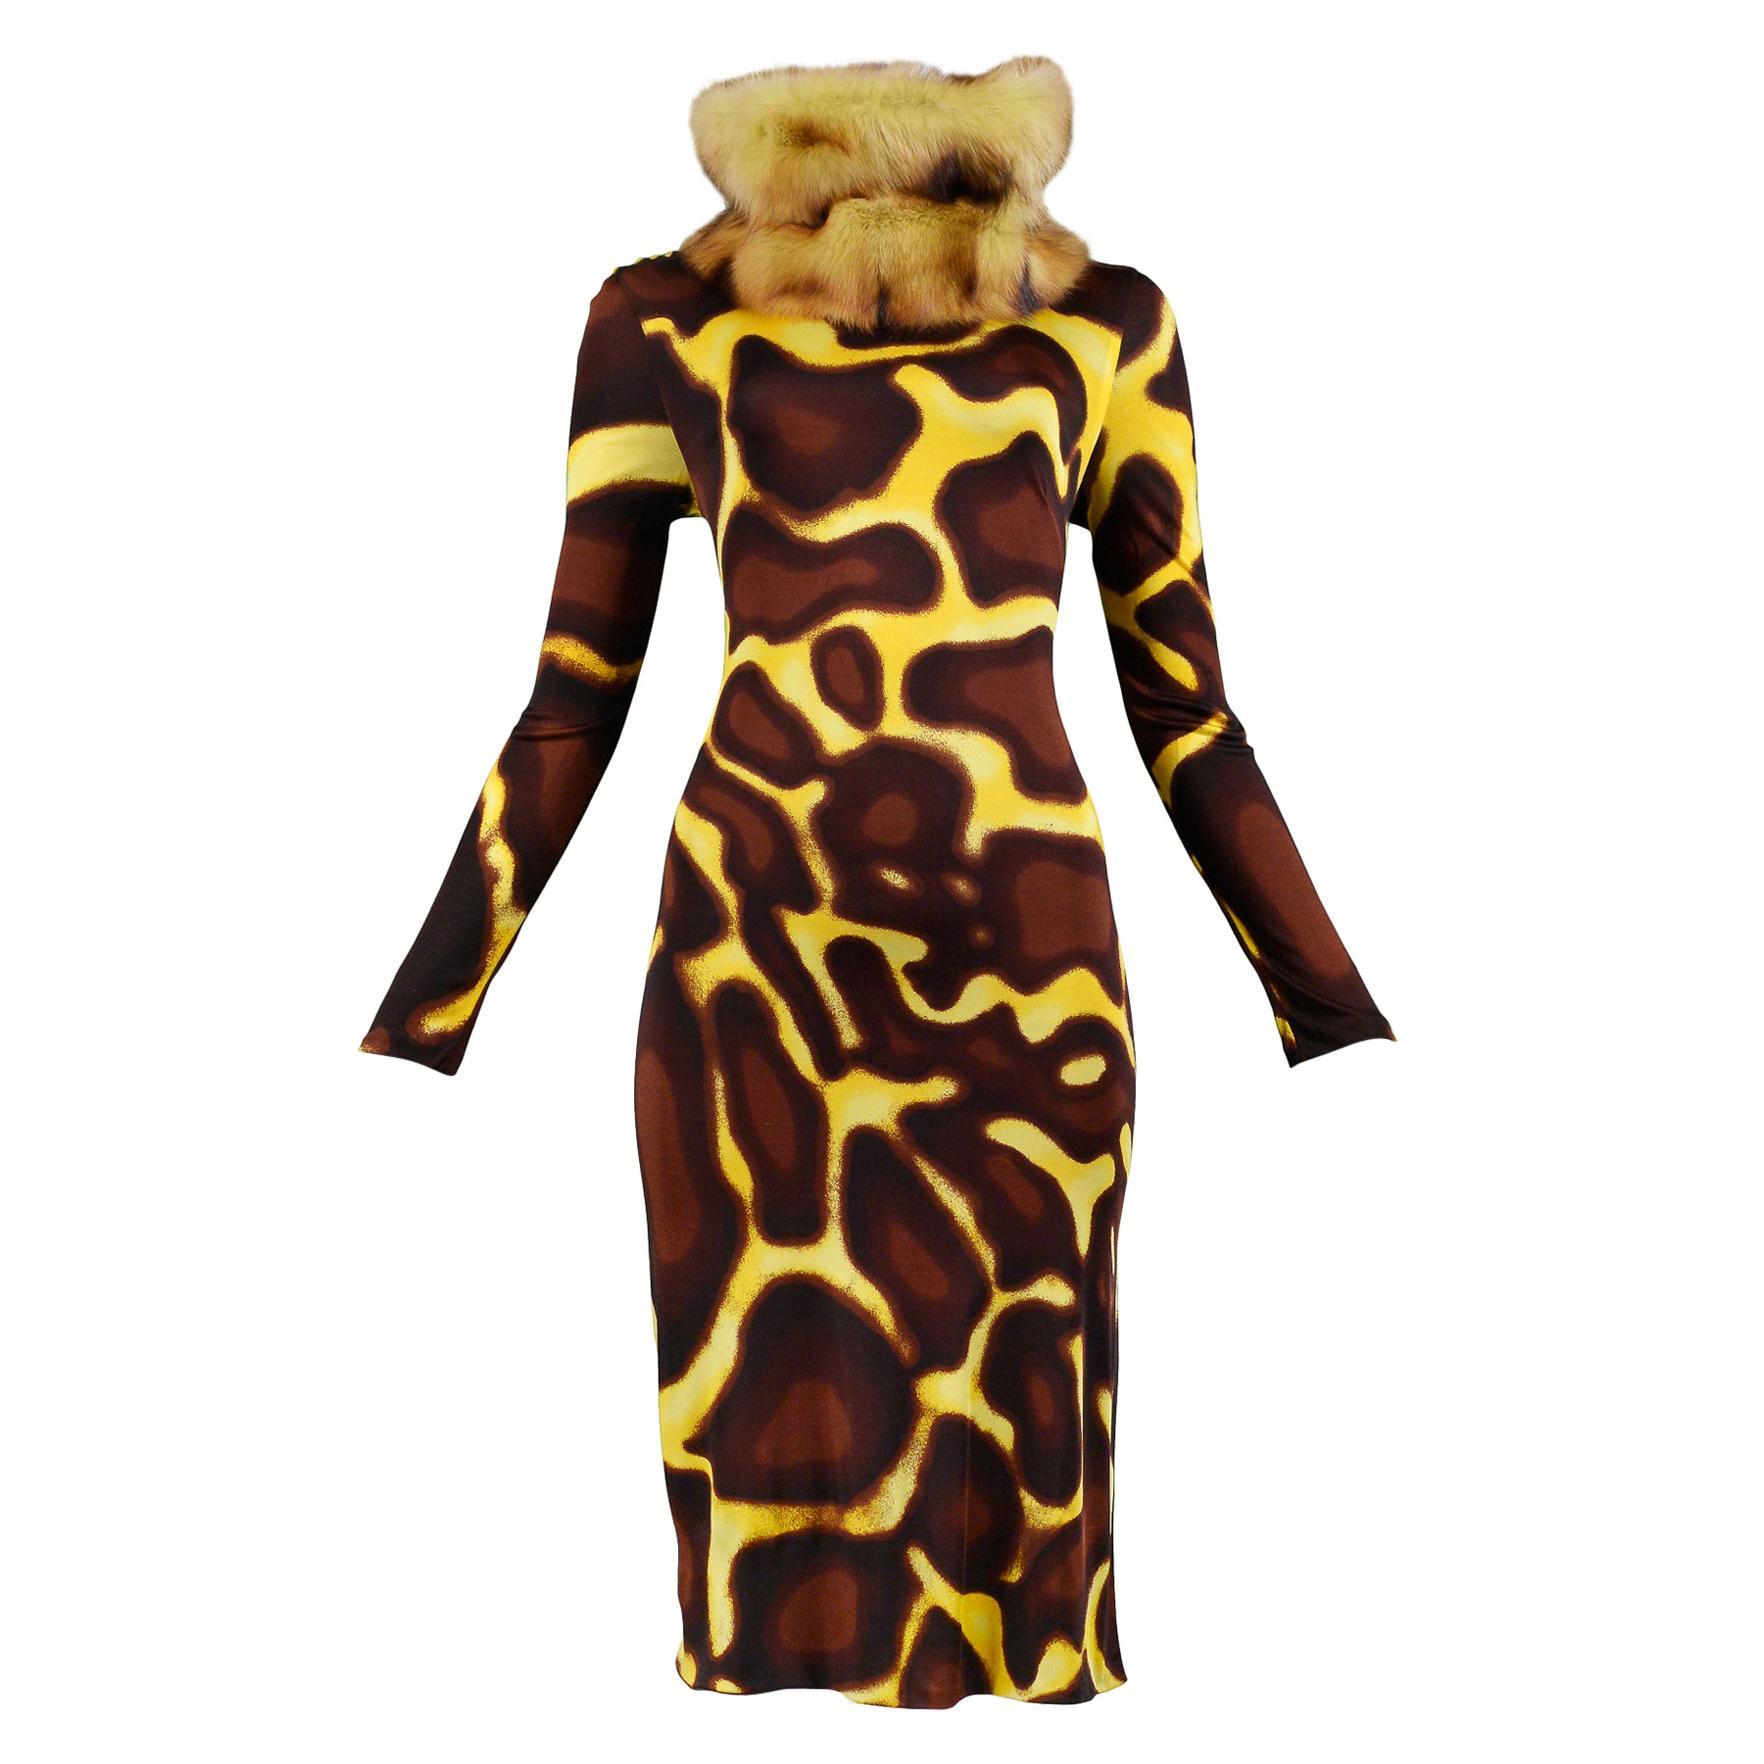 Vintage Versace Yellow Giraffe Print Dress with Fur Collar